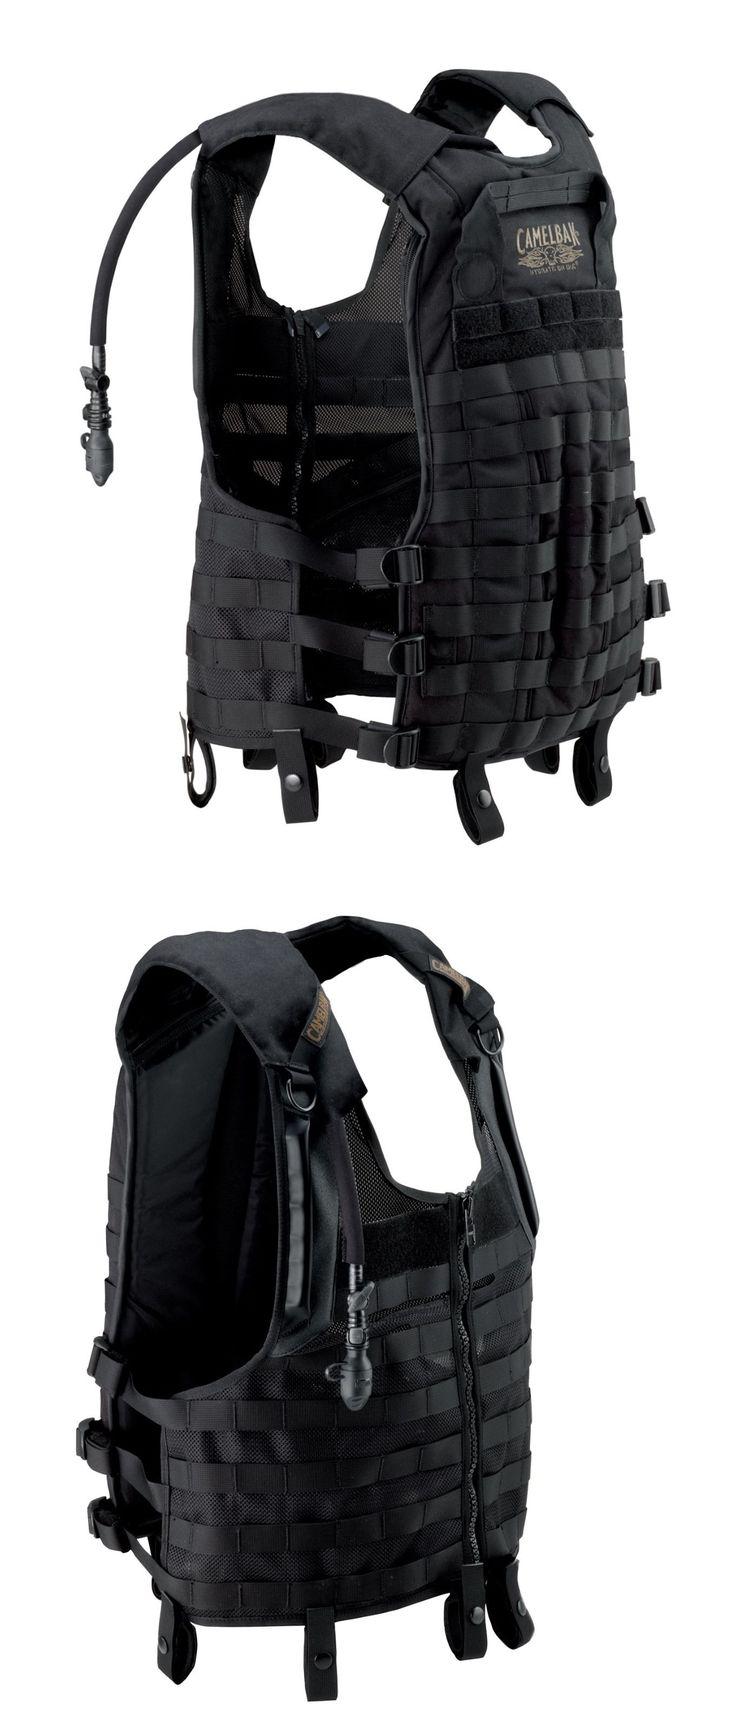 Hydration Packs 87125: Camelbak Delta 5 Tactical Vest 102 Oz 3.1L Black -> BUY IT NOW ONLY: $100 on eBay!